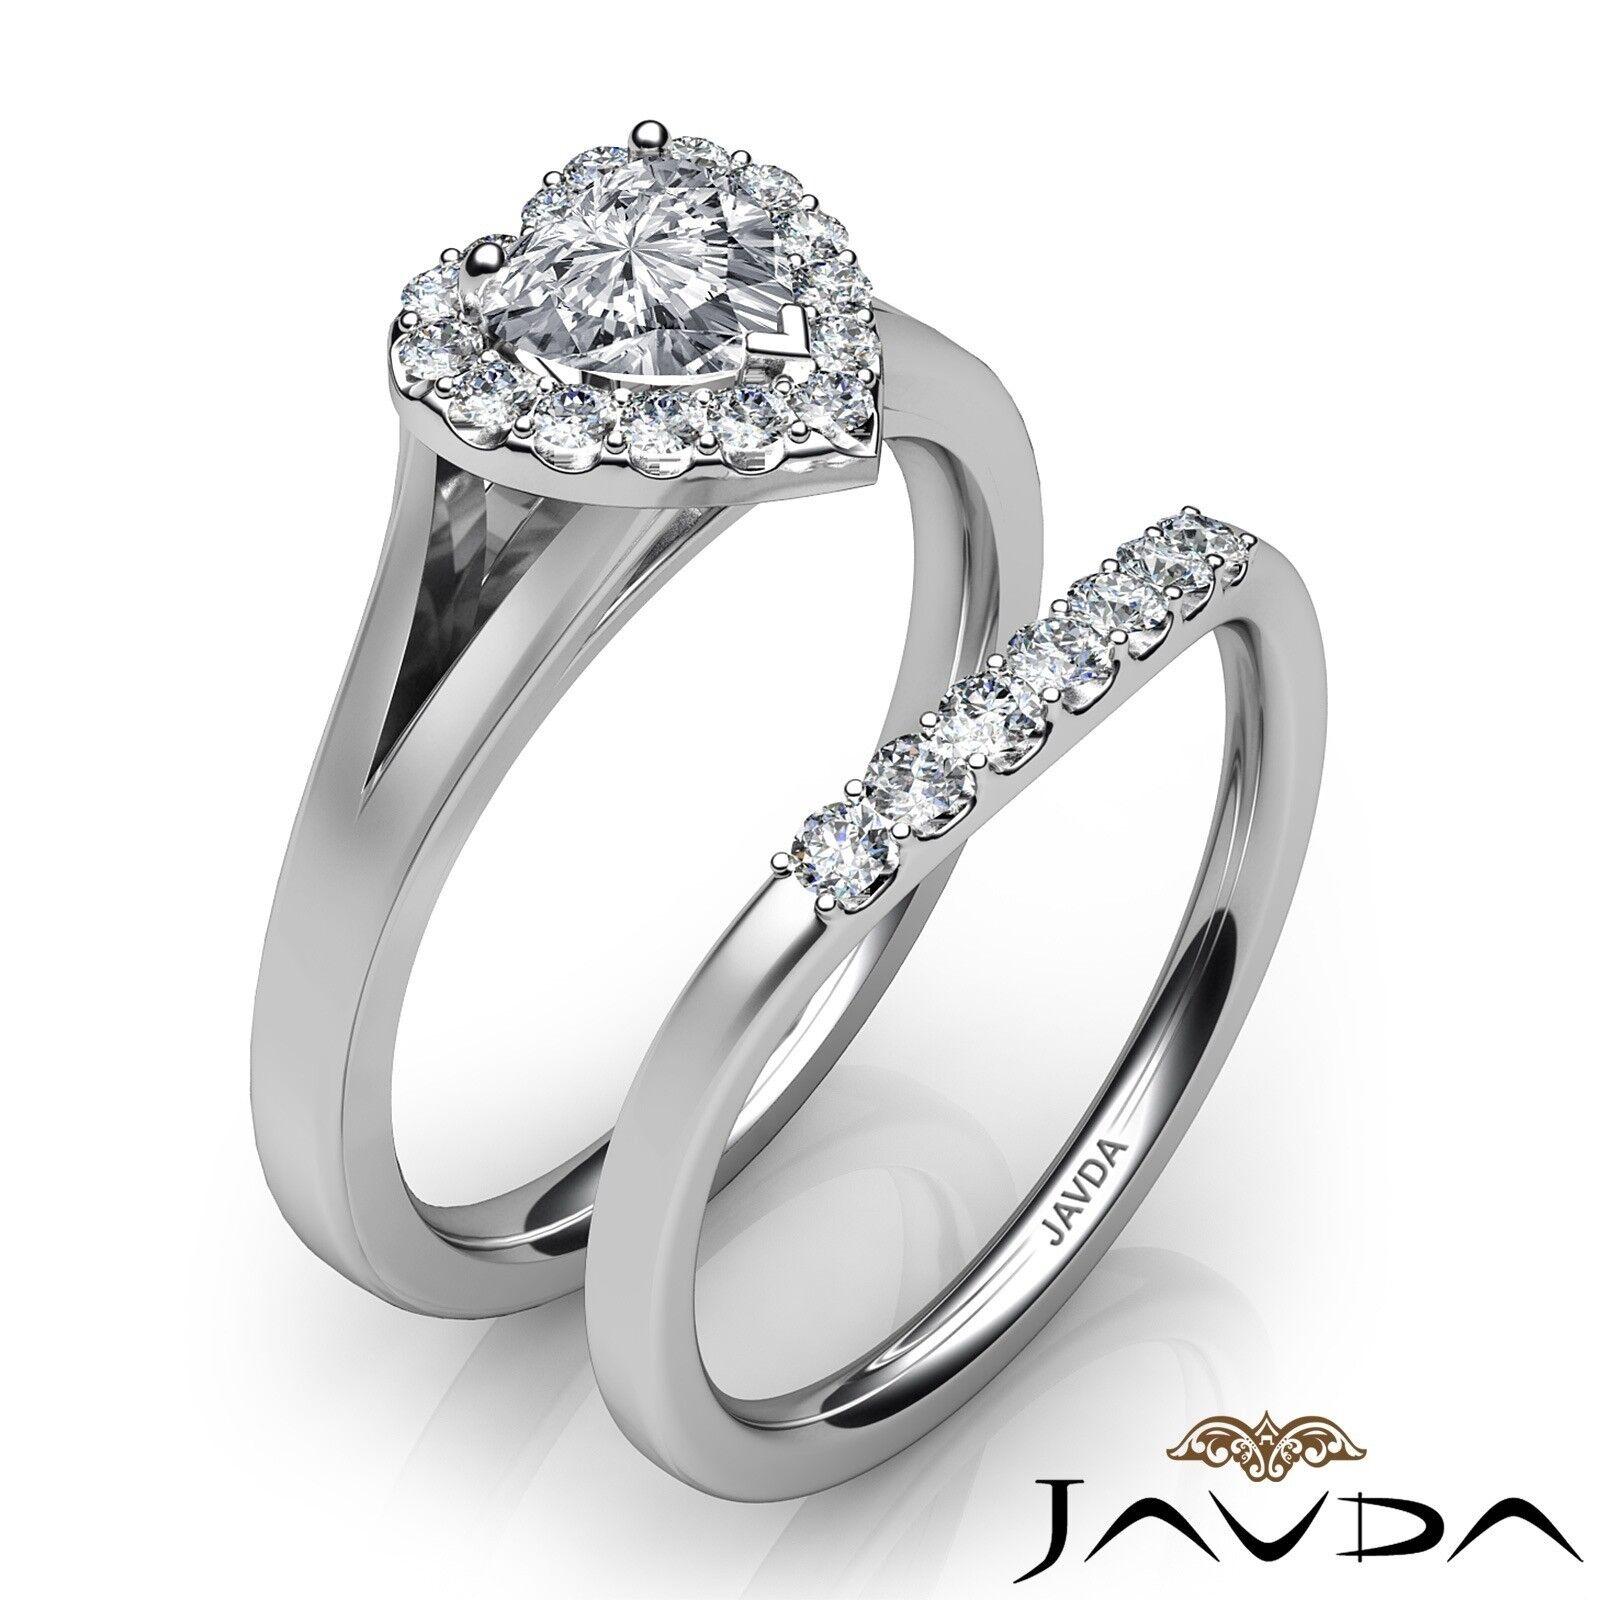 1.22ctw Pave Halo Bridal Set Heart Diamond Engagement Ring GIA G-VVS2 White Gold 2